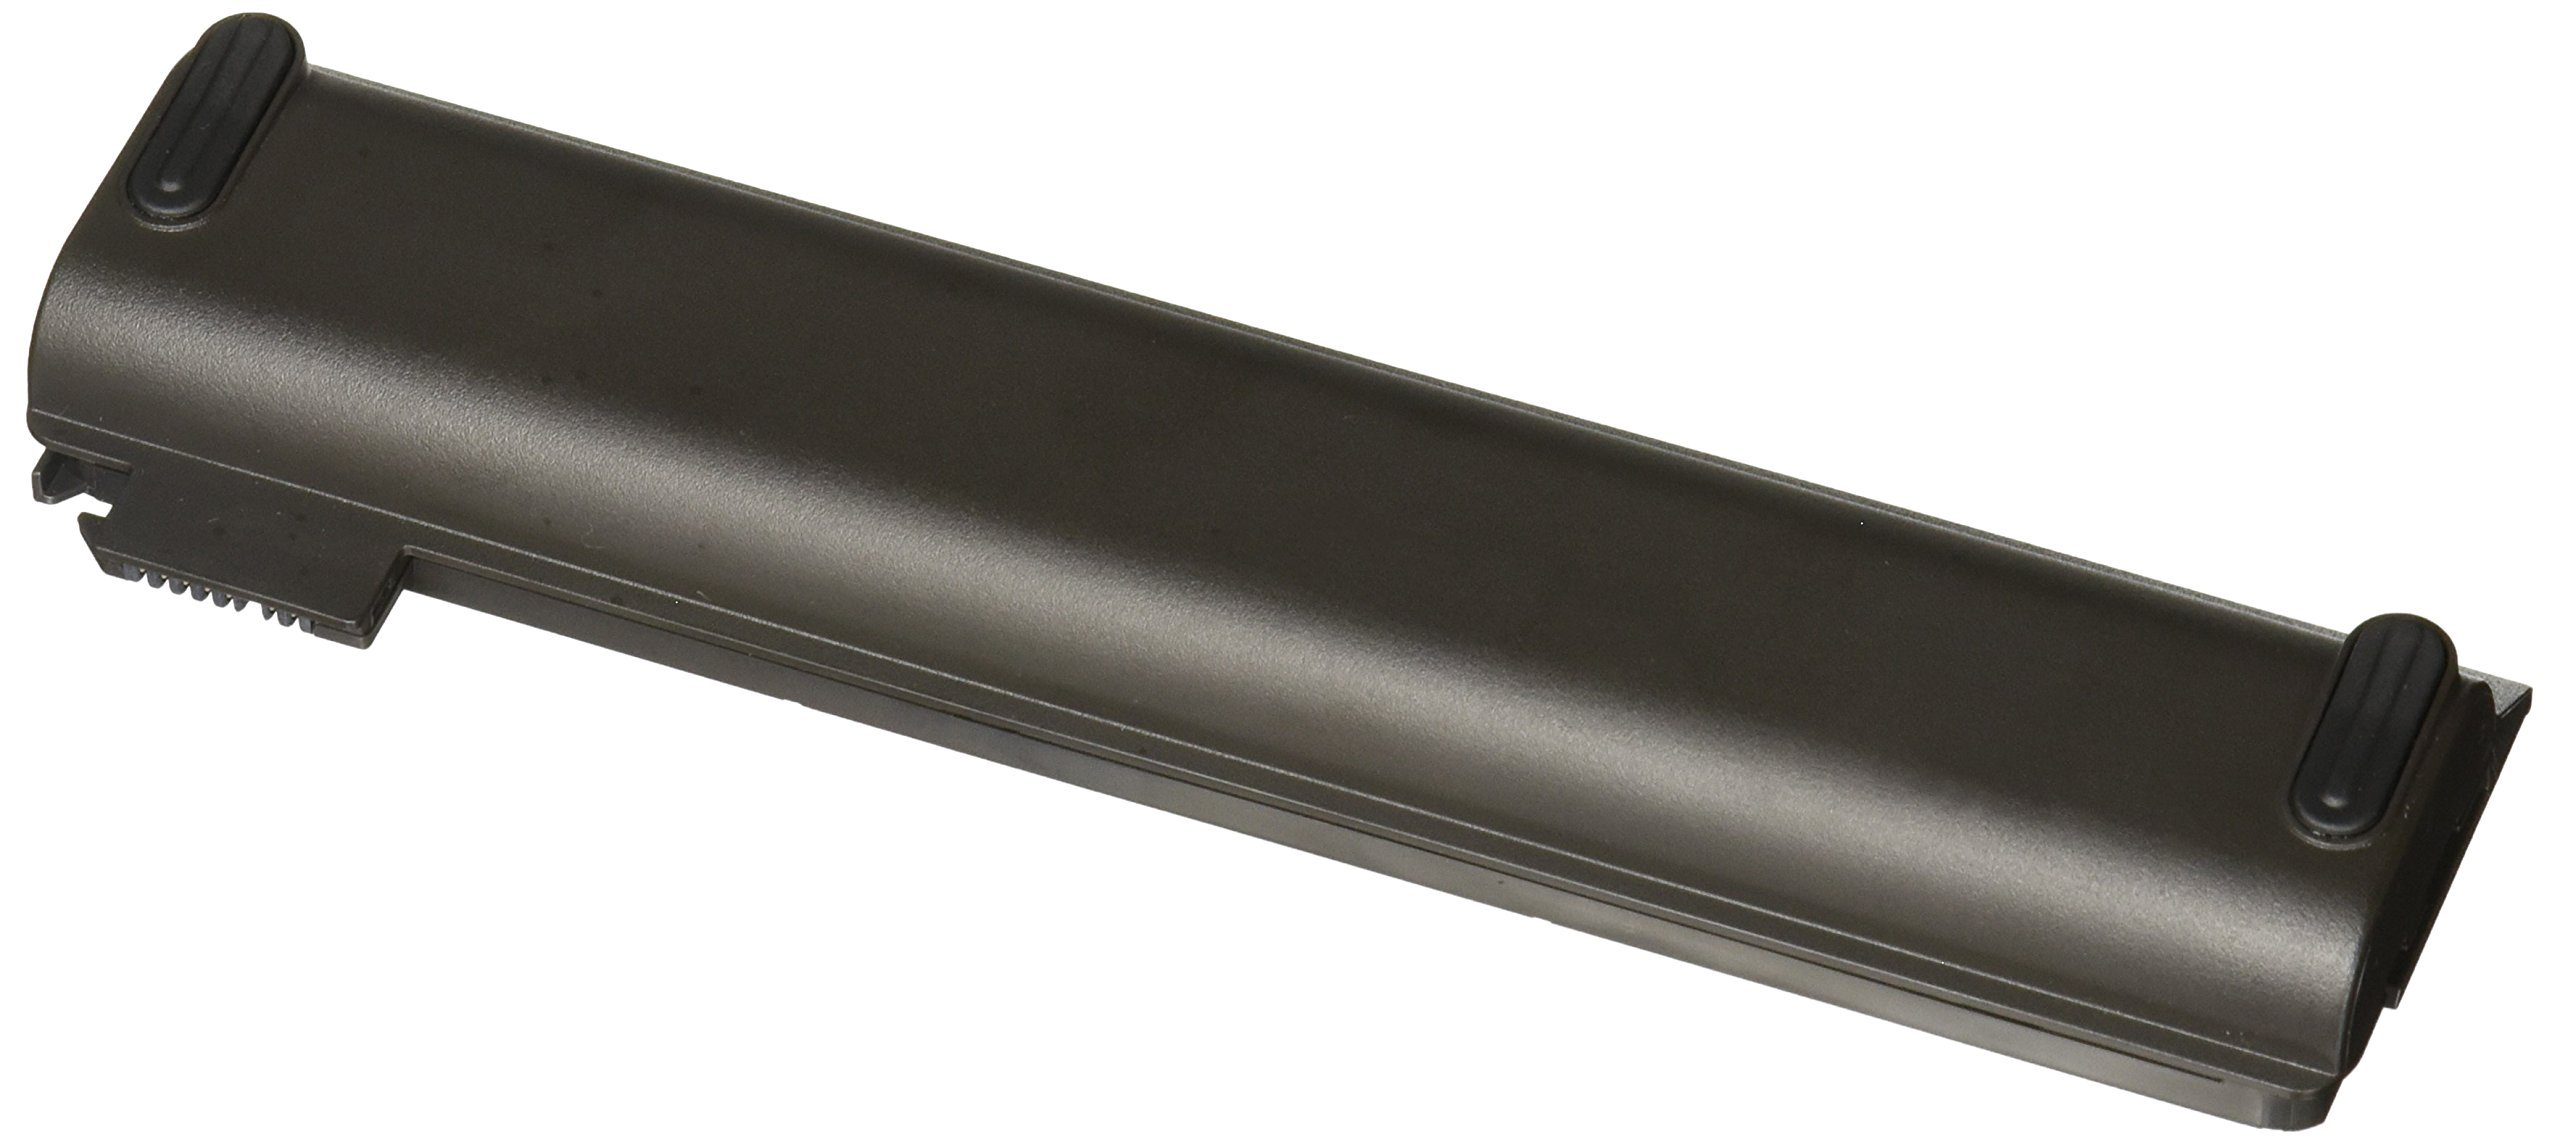 Lenovo ThinkPad Battery 68 + ( Retail MFG P/N; 0C52862 ) Lithium Ion 6 Cell Battery